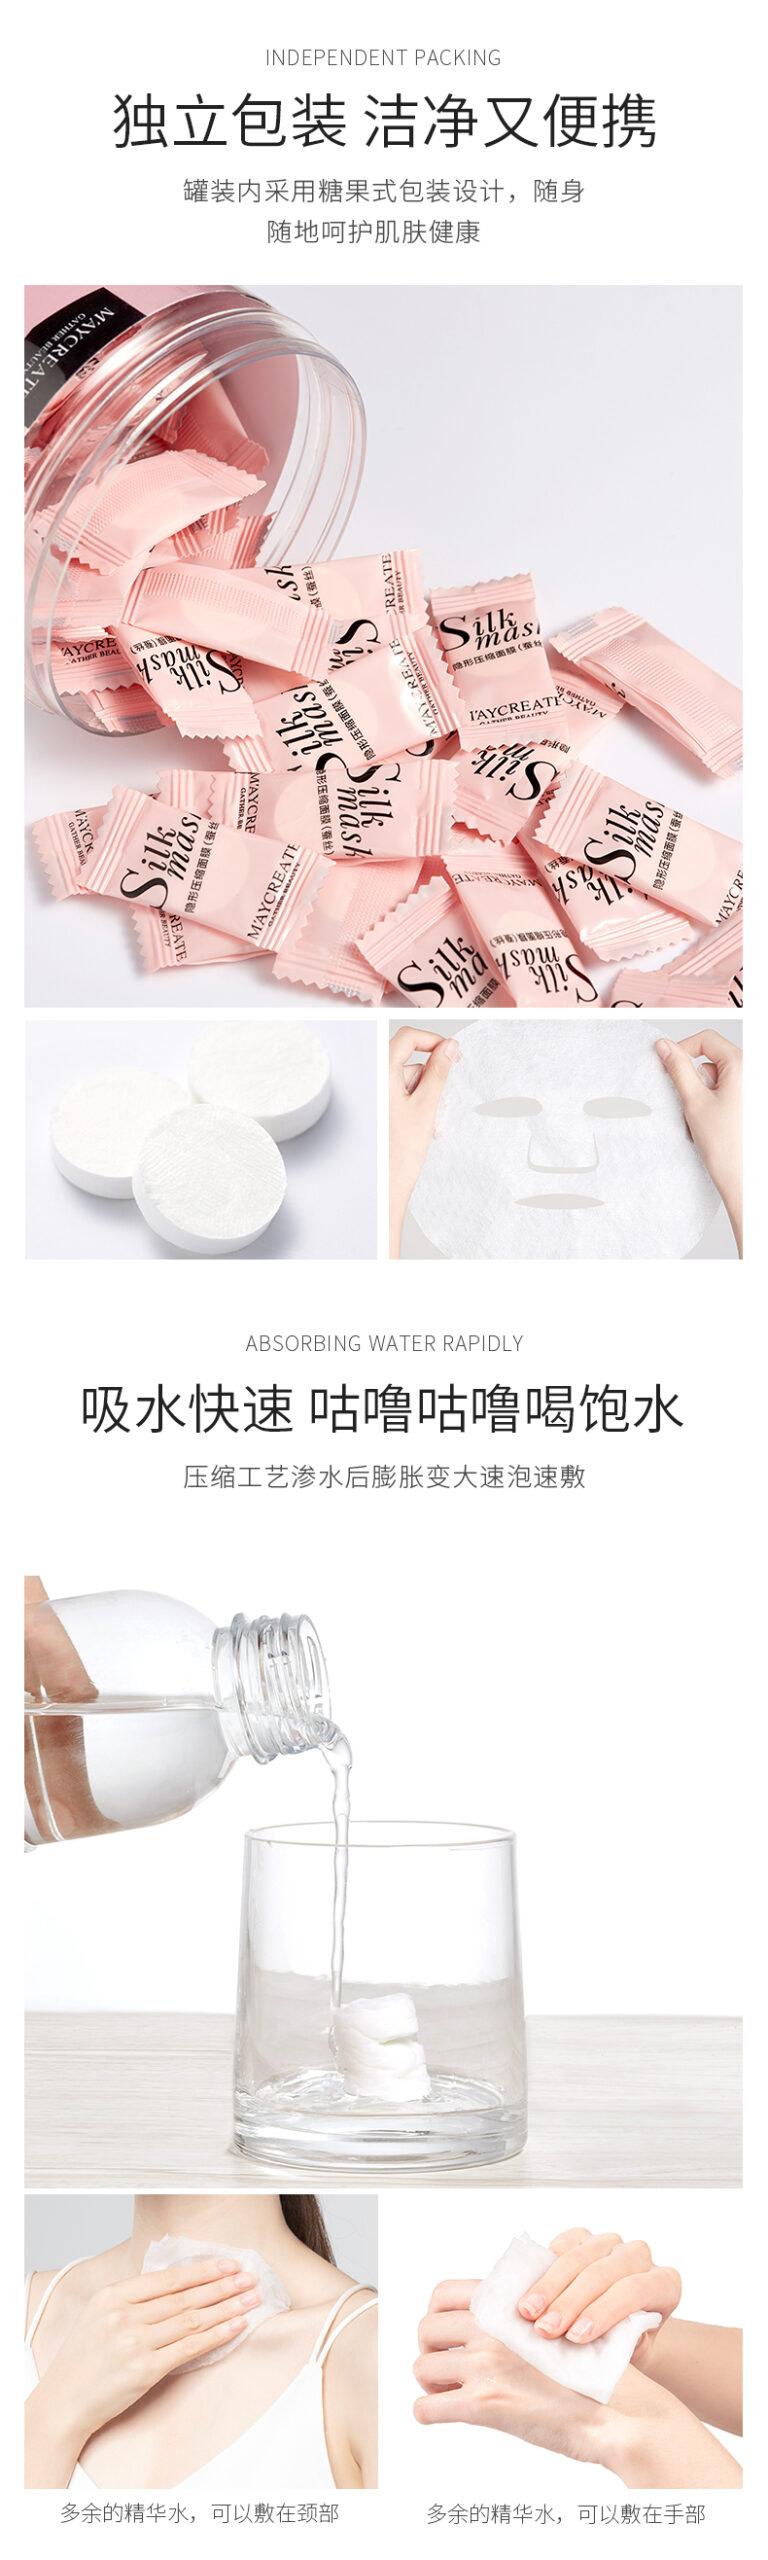 product-Maycreate-隐形压缩面膜(蚕丝)